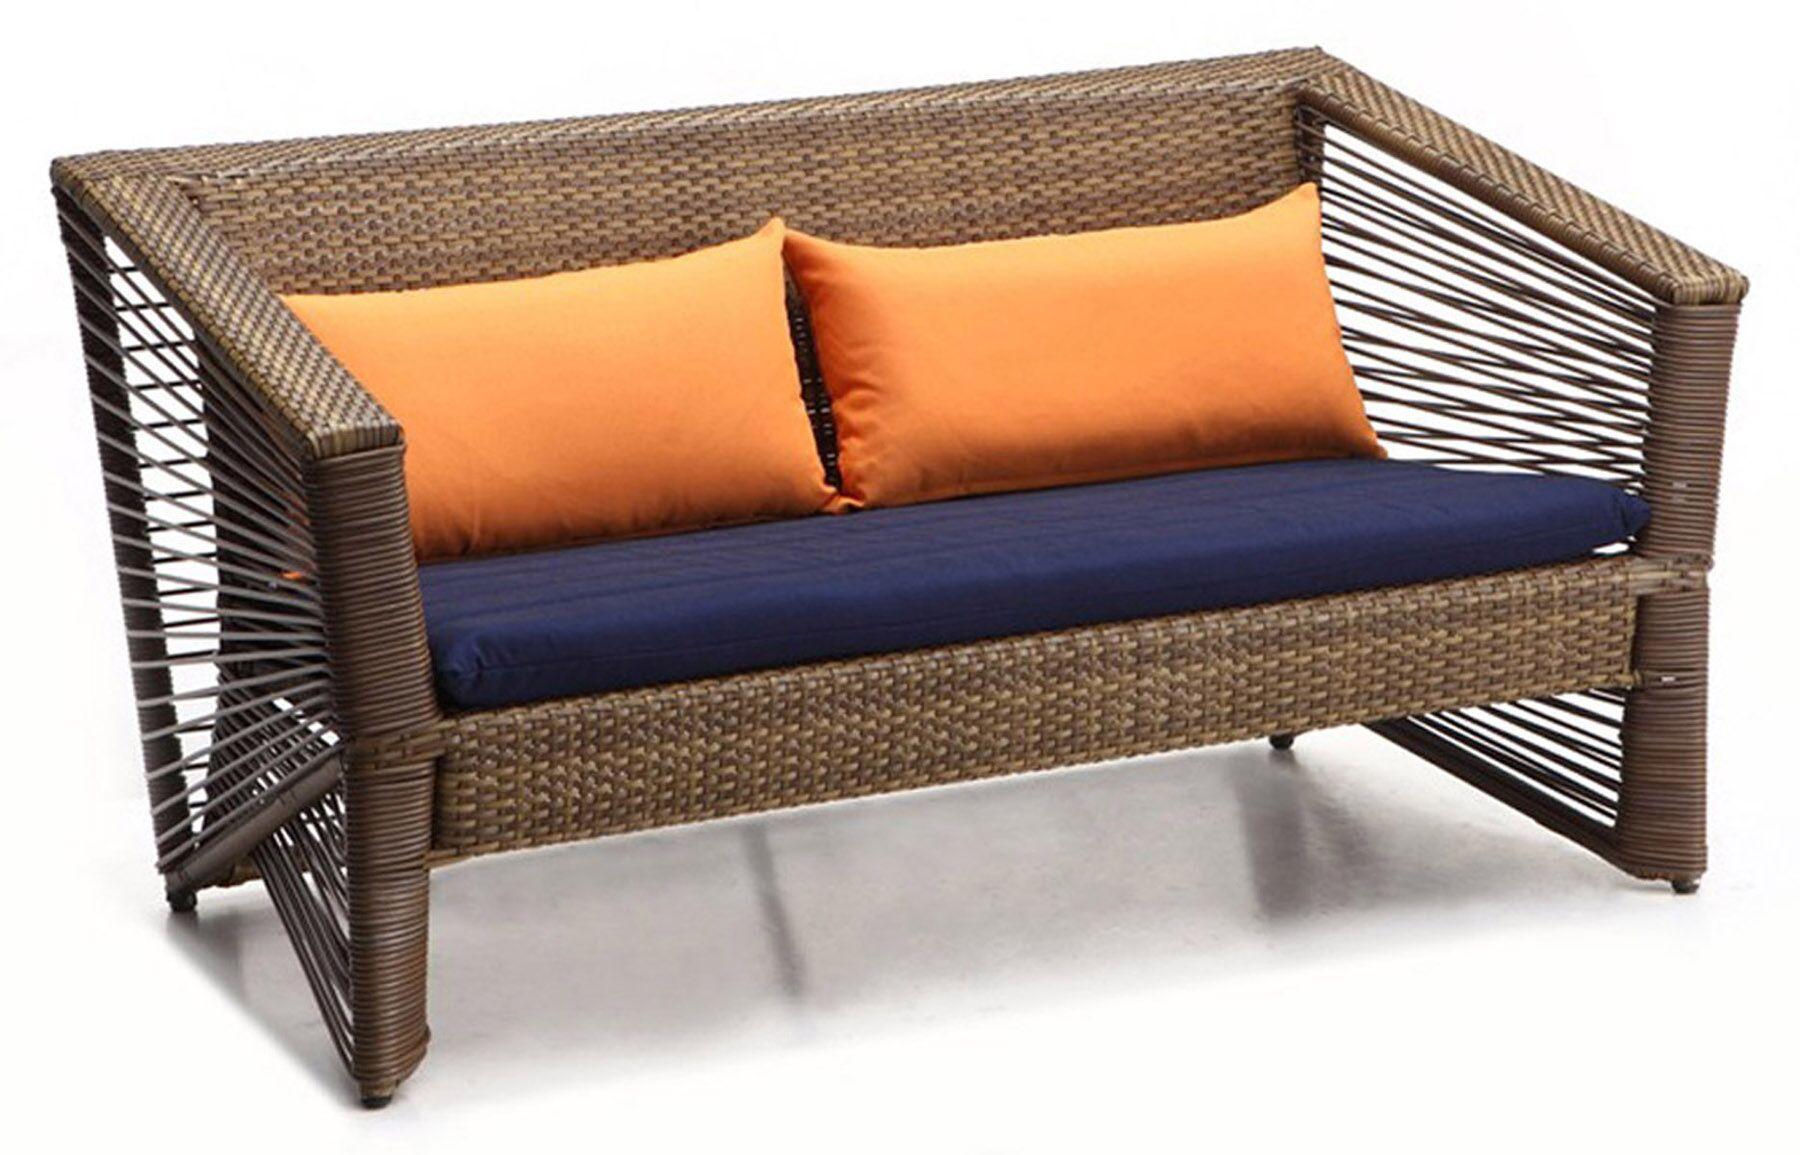 Borneo Sofa with Cushions